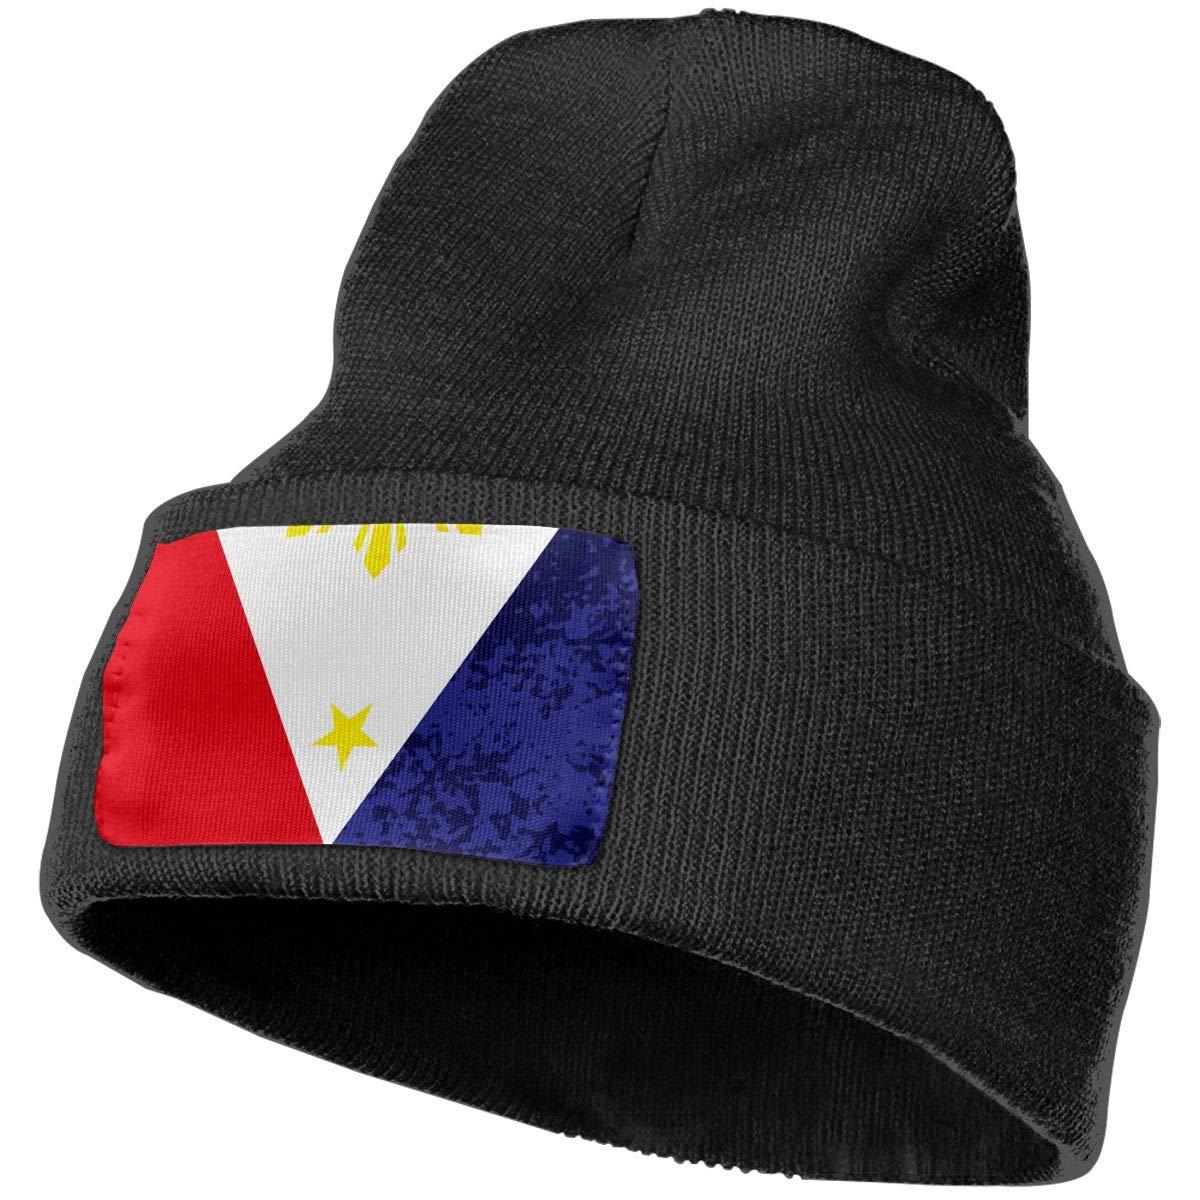 Sheery Filipino Flag Casual Knit Cap for Men Women 100/% Acrylic Acid Skull Cap Woolen Hat